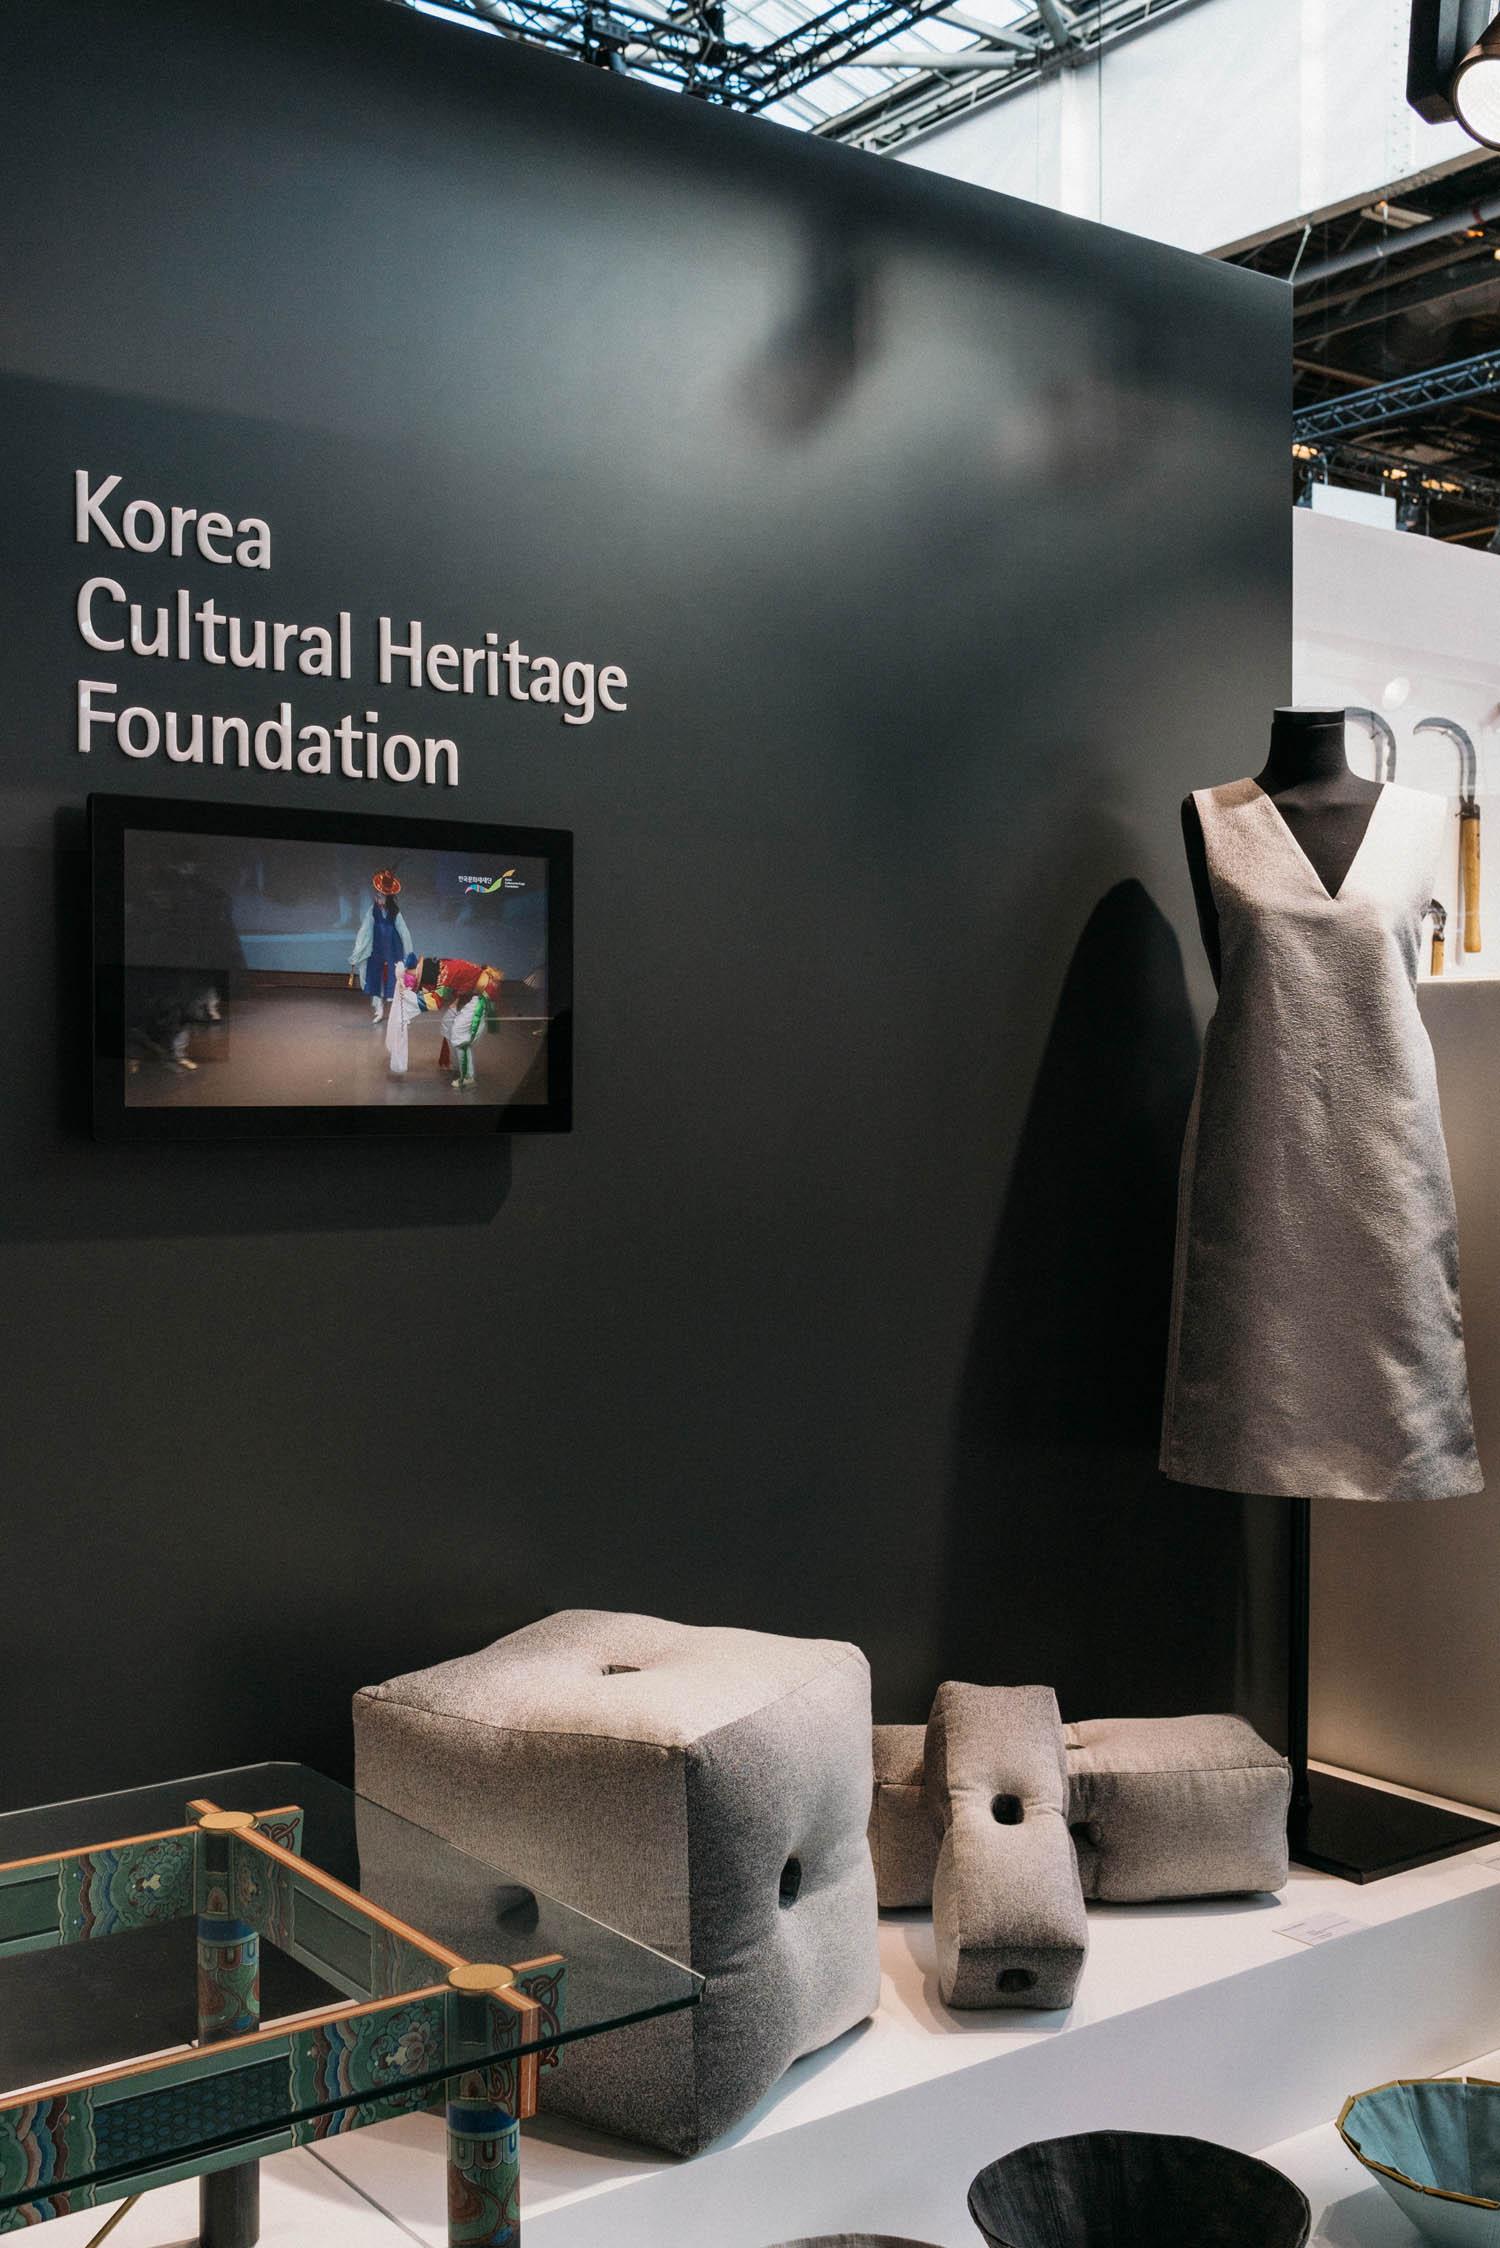 Korea Cultural Heritage Foundation